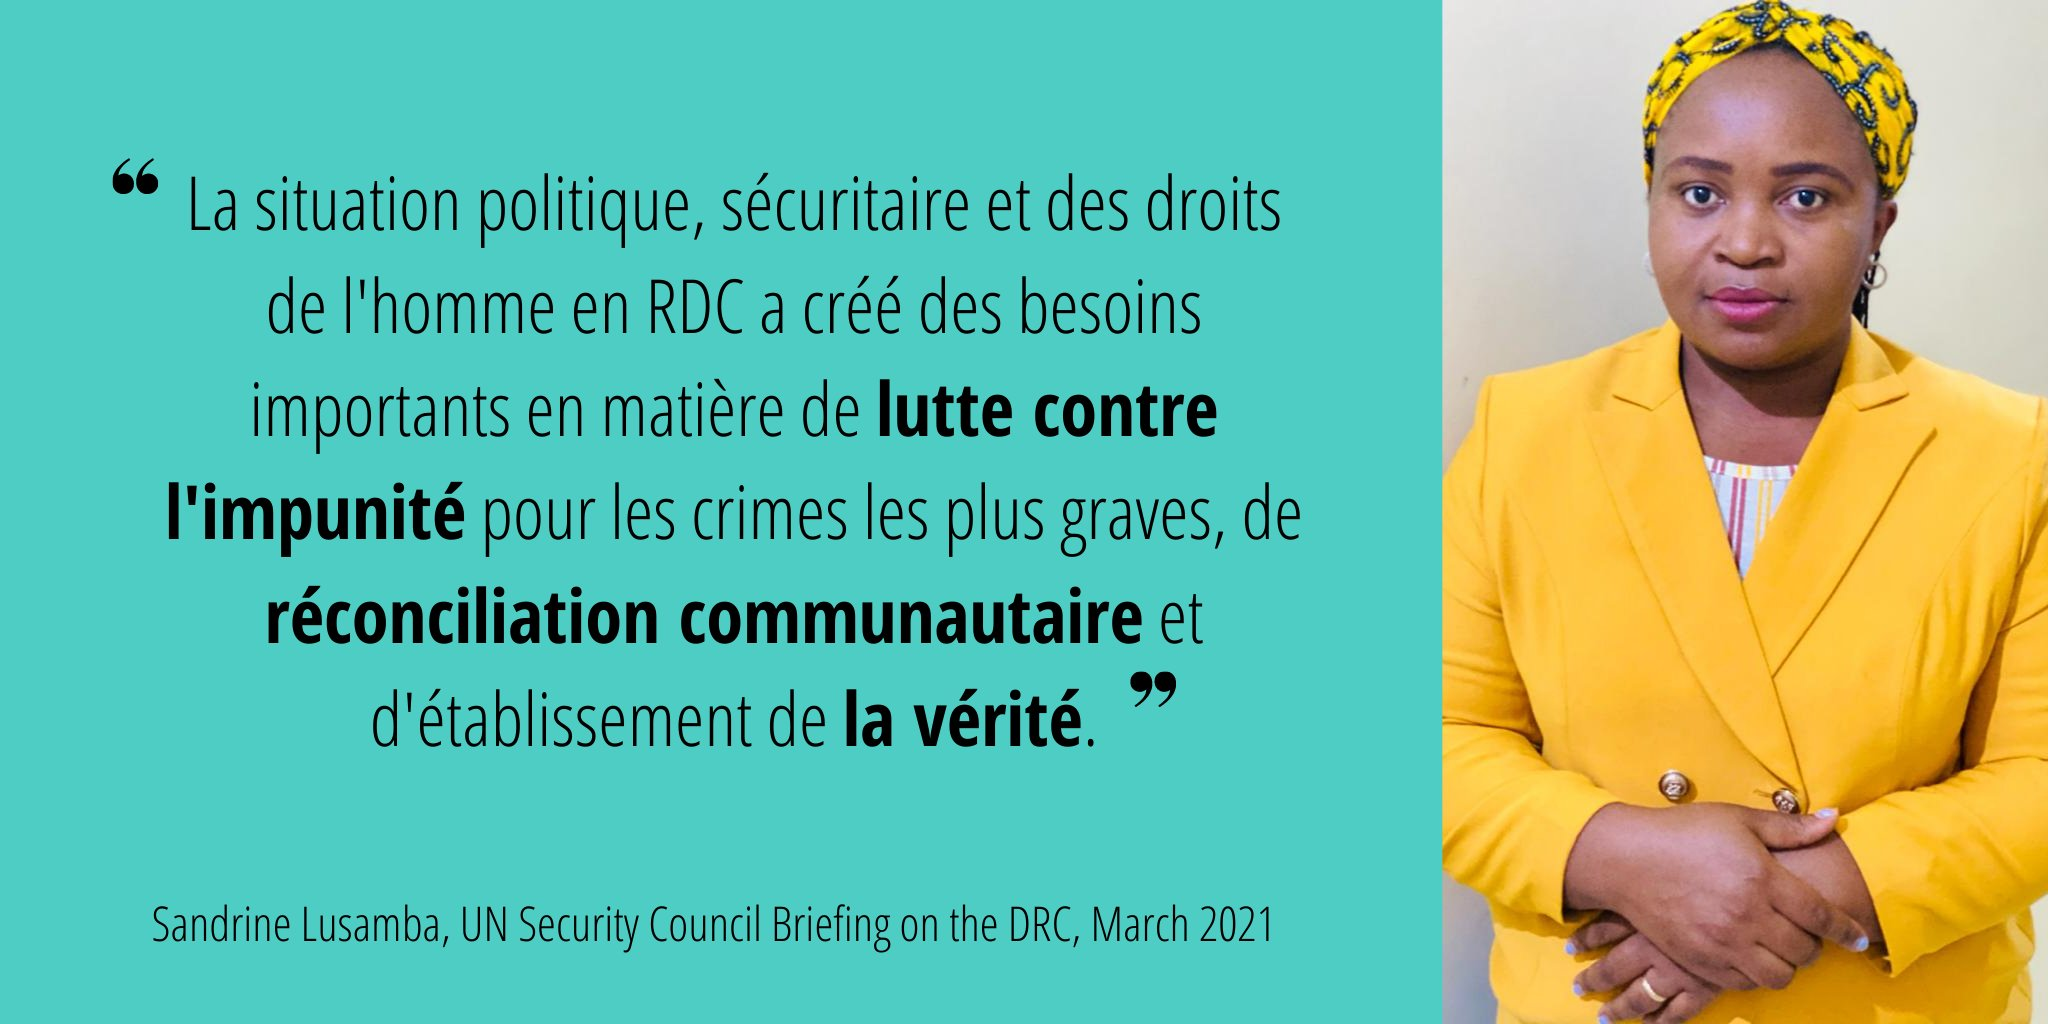 Sandrine Lusamba de Sofepadi s'adresse au Conseil de sécurité des Nations unies